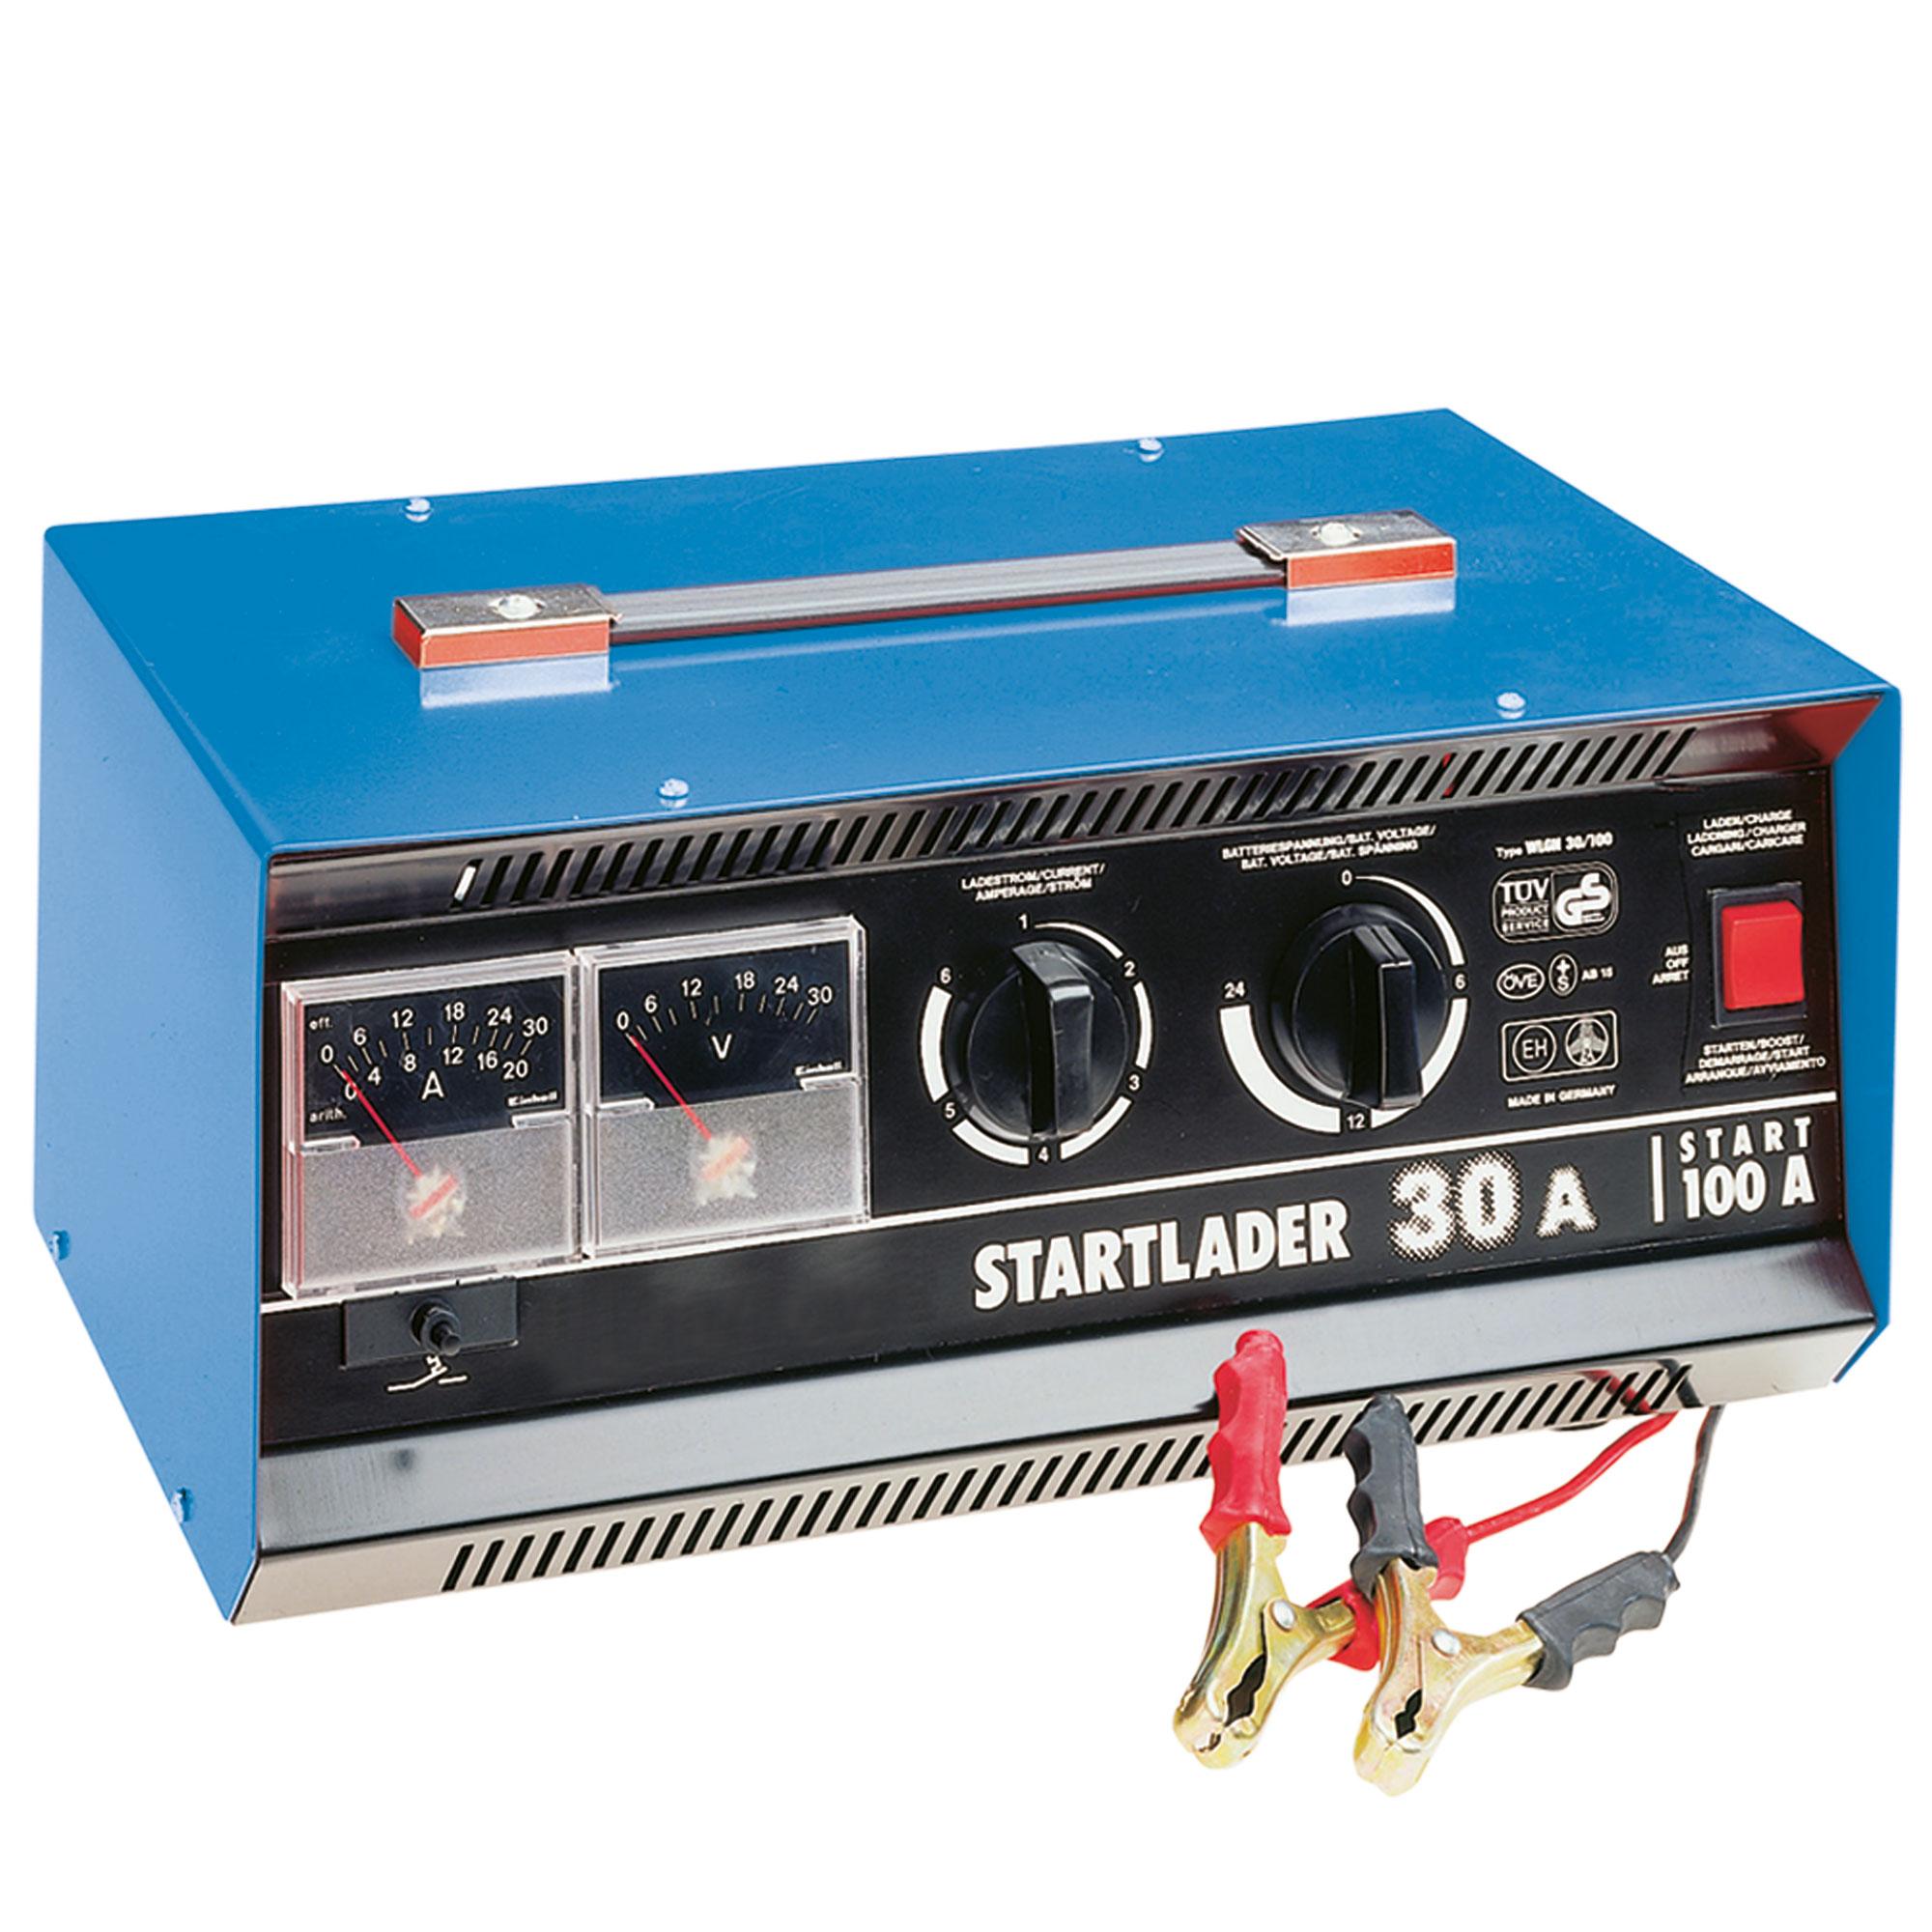 Startlader WLGN 30/100